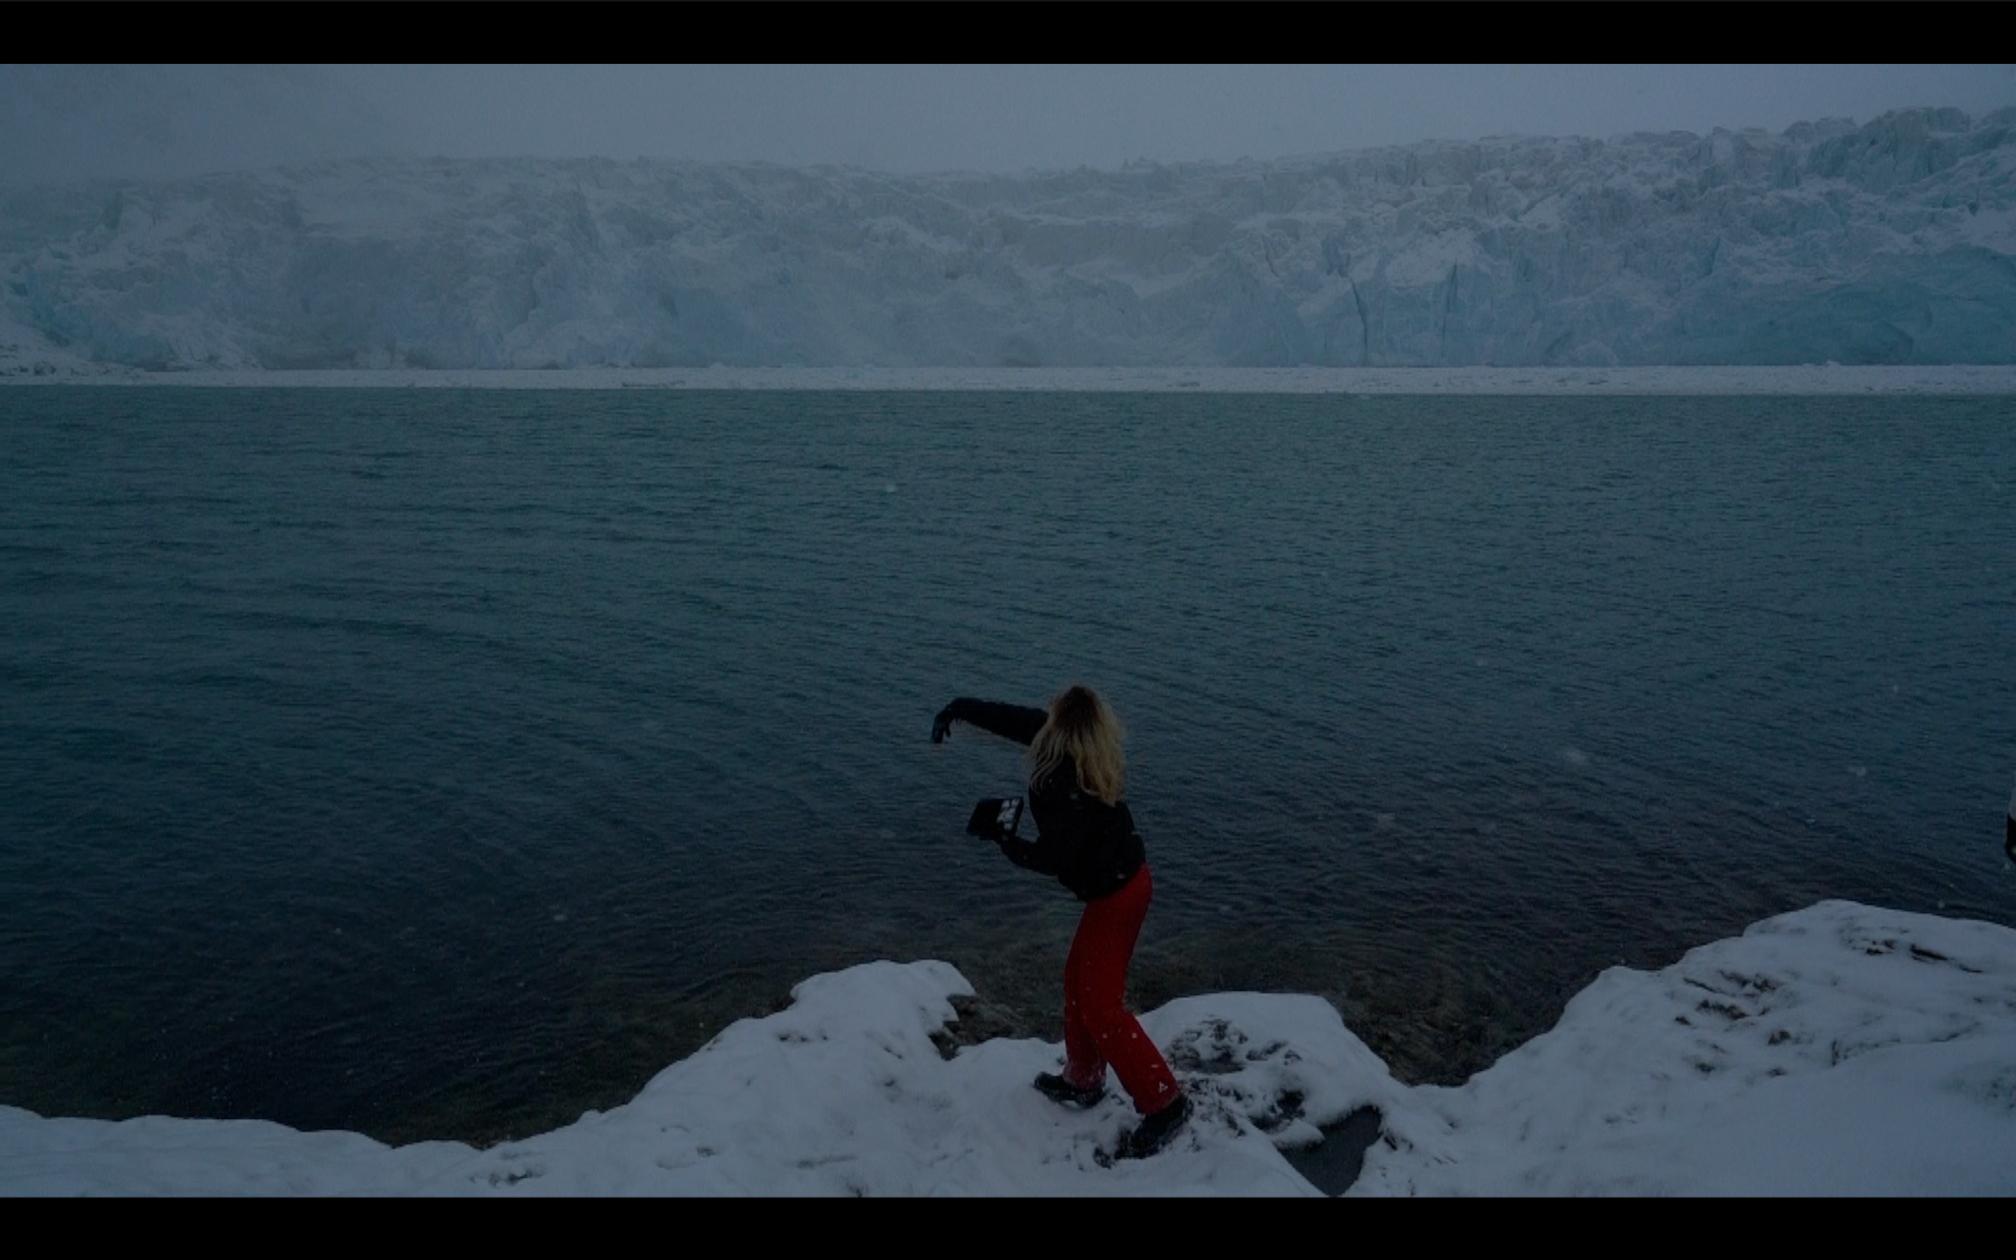 Screen-Shot-Ice1.jpg